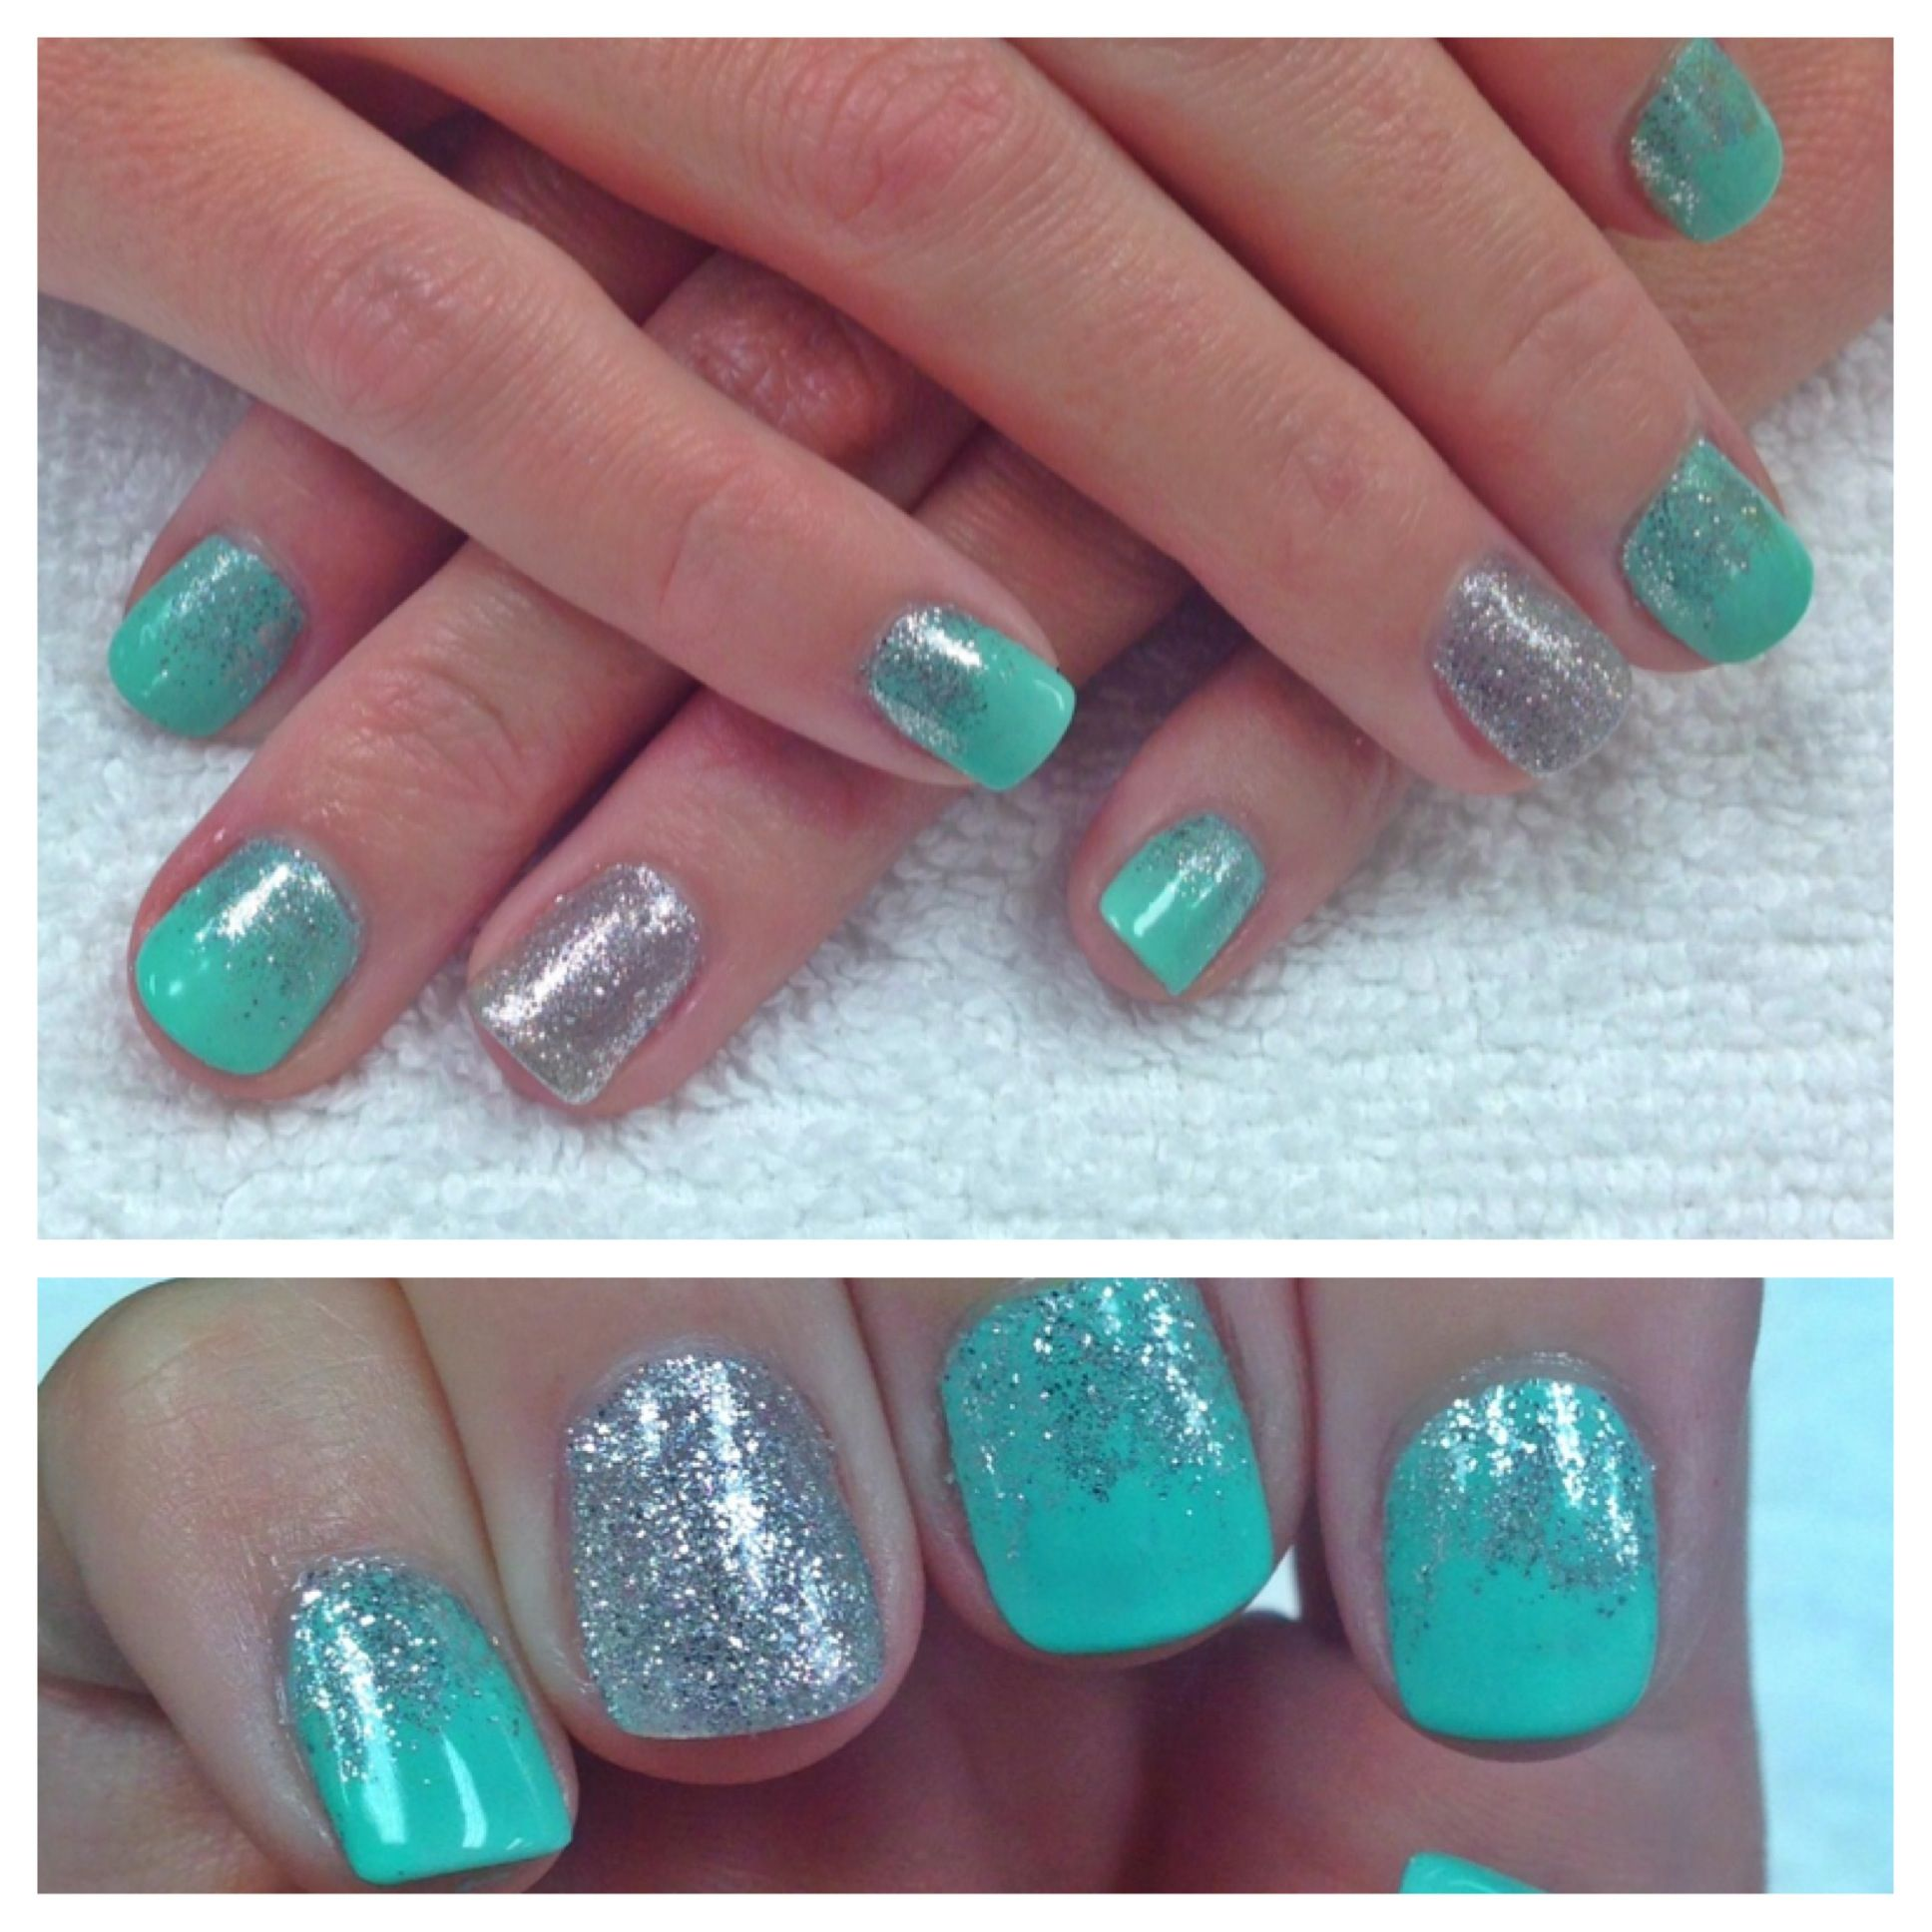 Glitter fade nail art | Nails | Pinterest | Glitter fade nails ...